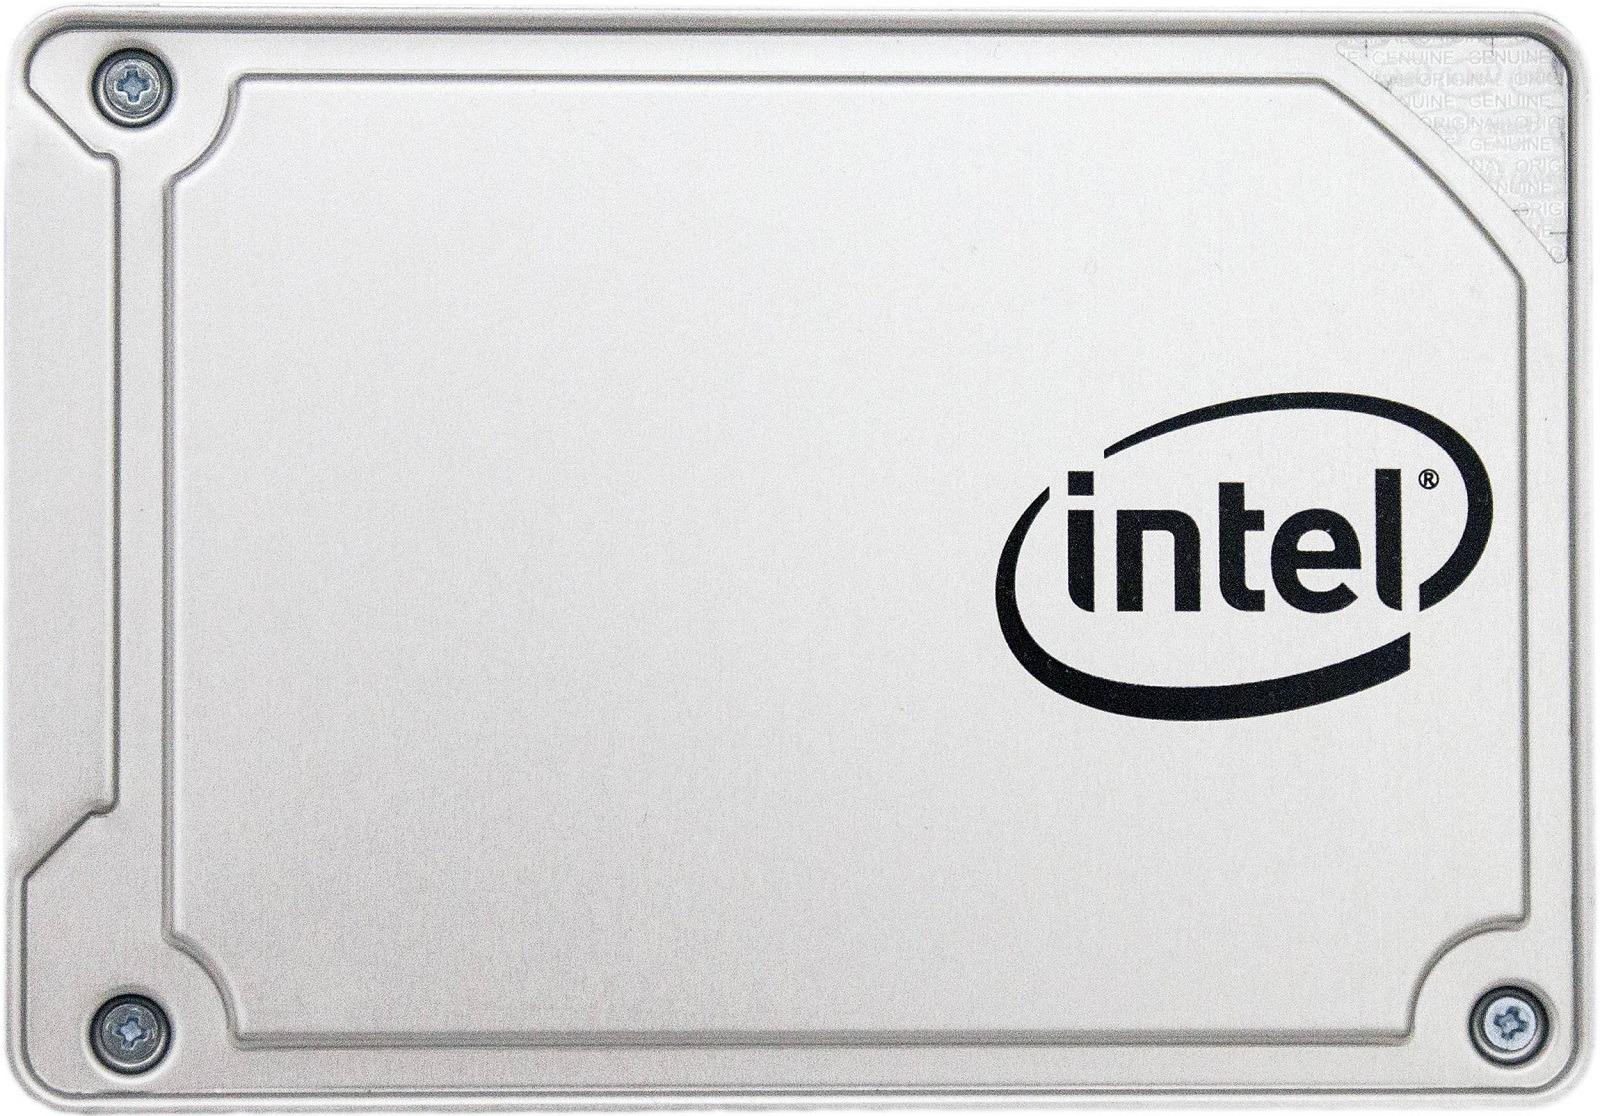 SSD накопитель Intel Original S3110 128GB, SSDSC2KI128G801 963850 твердотельный накопитель ssd intel ssd dc p3520 450gb ssdpe2mx450g701 u 2 2 5 r1200 w600